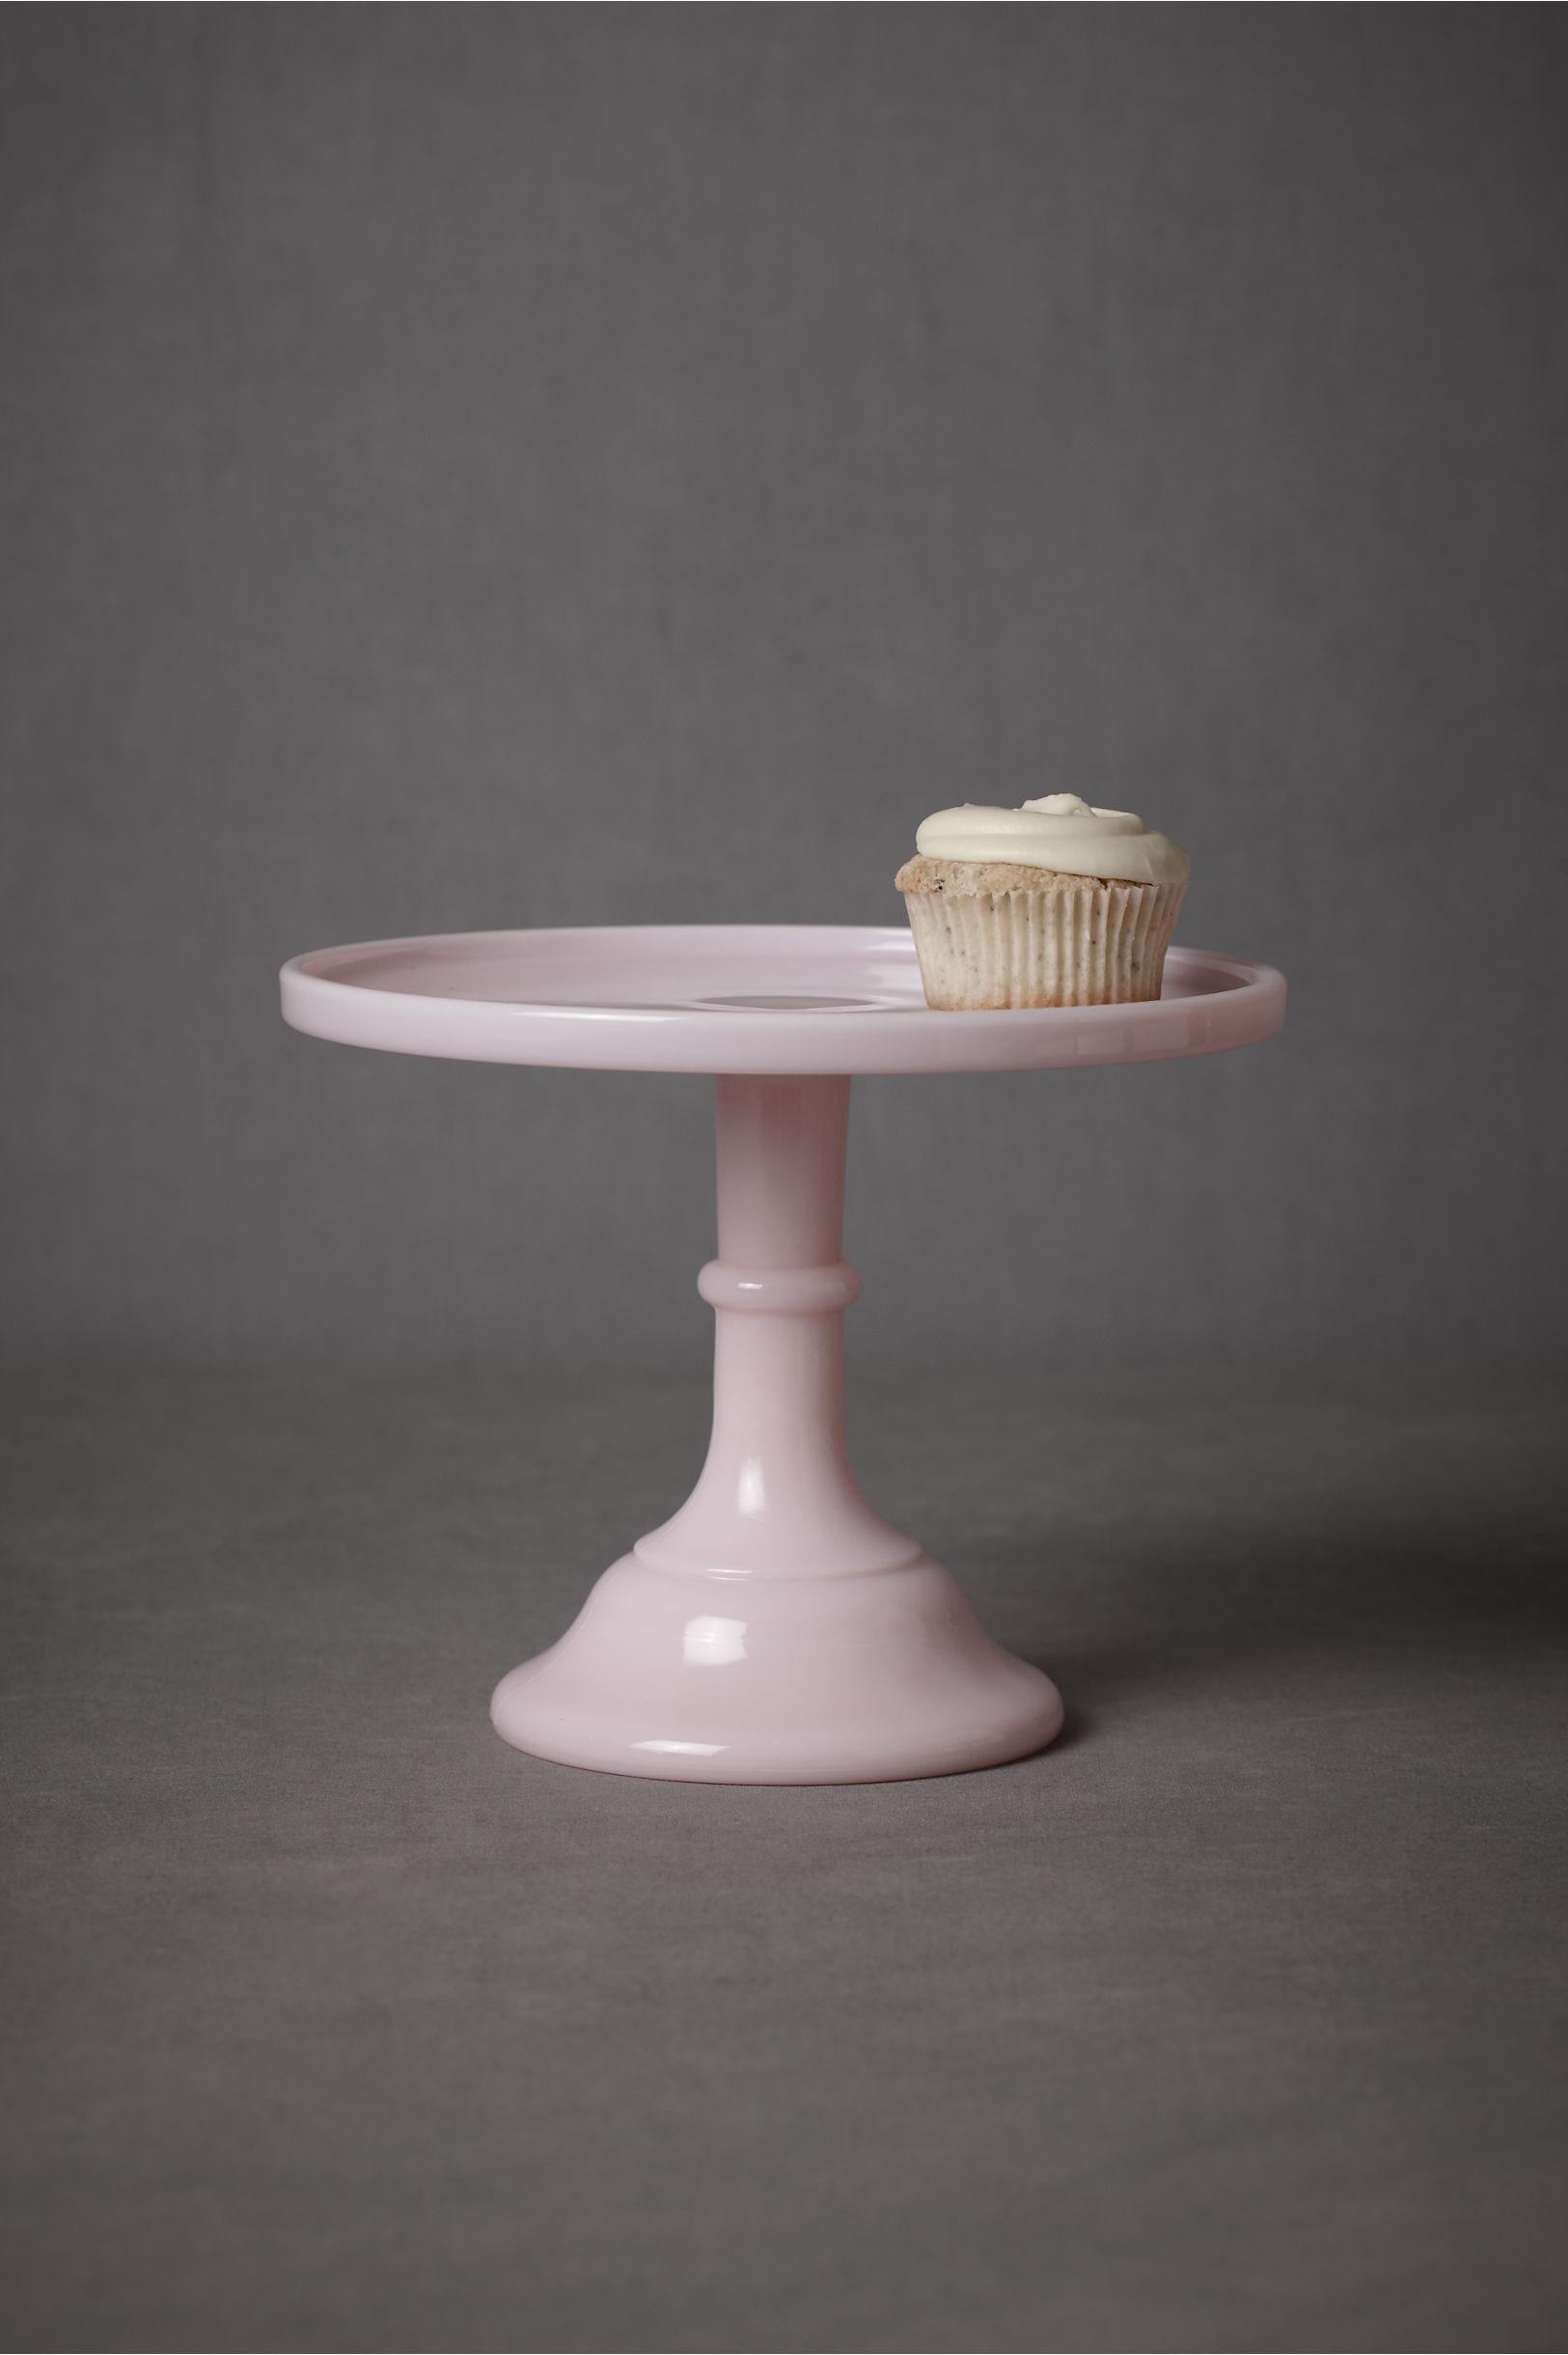 large shop bella cake stand bon hue copy decor soft turquoise leo rimmed rosanna pedestal img